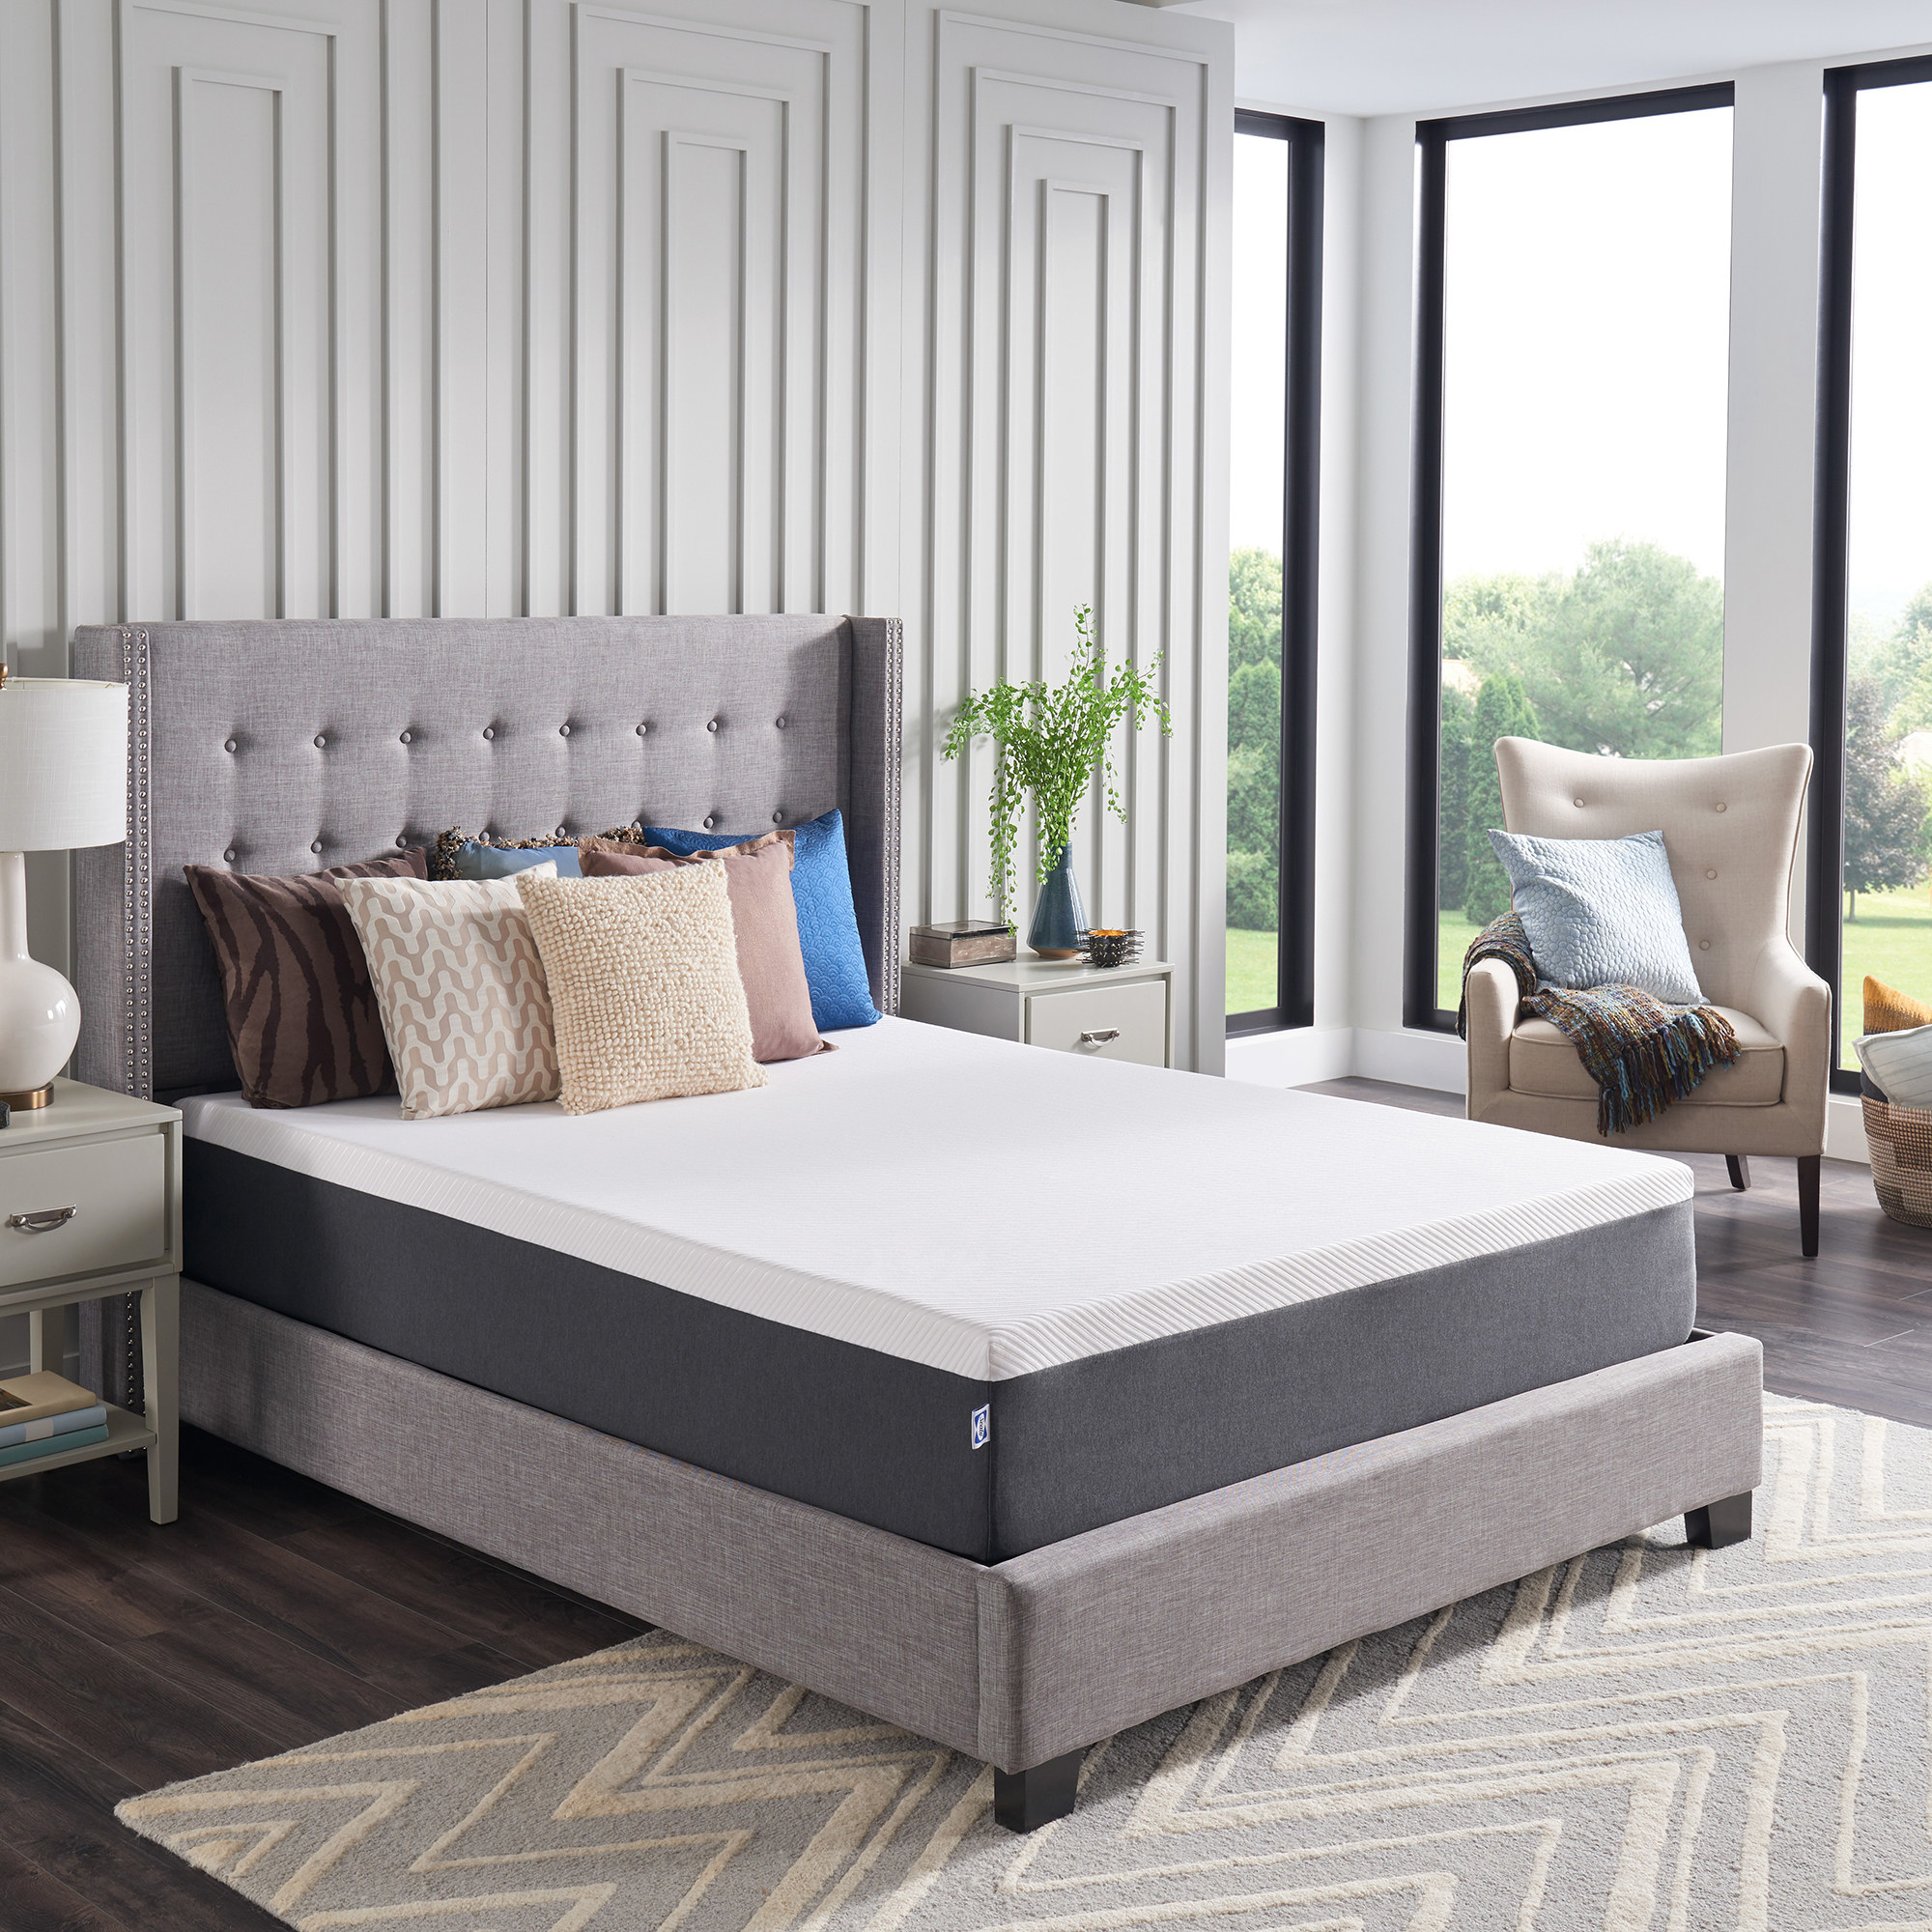 A white mattress on a grey bed